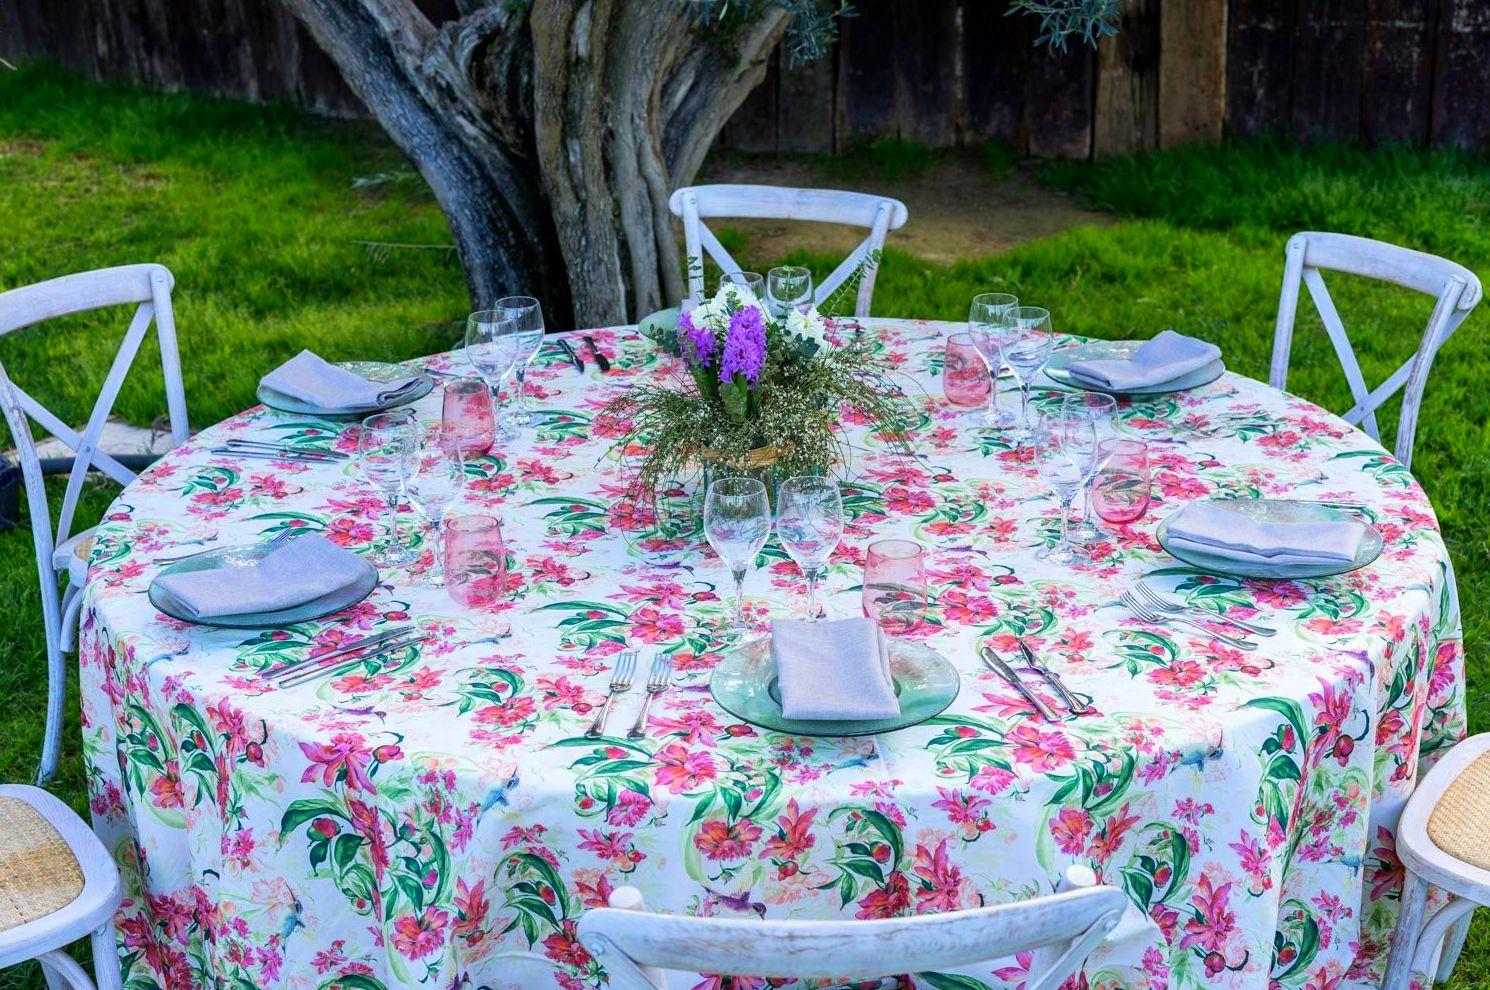 Alquiler de mantelerias para eventos y hosteleria: Alquiler de Mantelería & Menaje